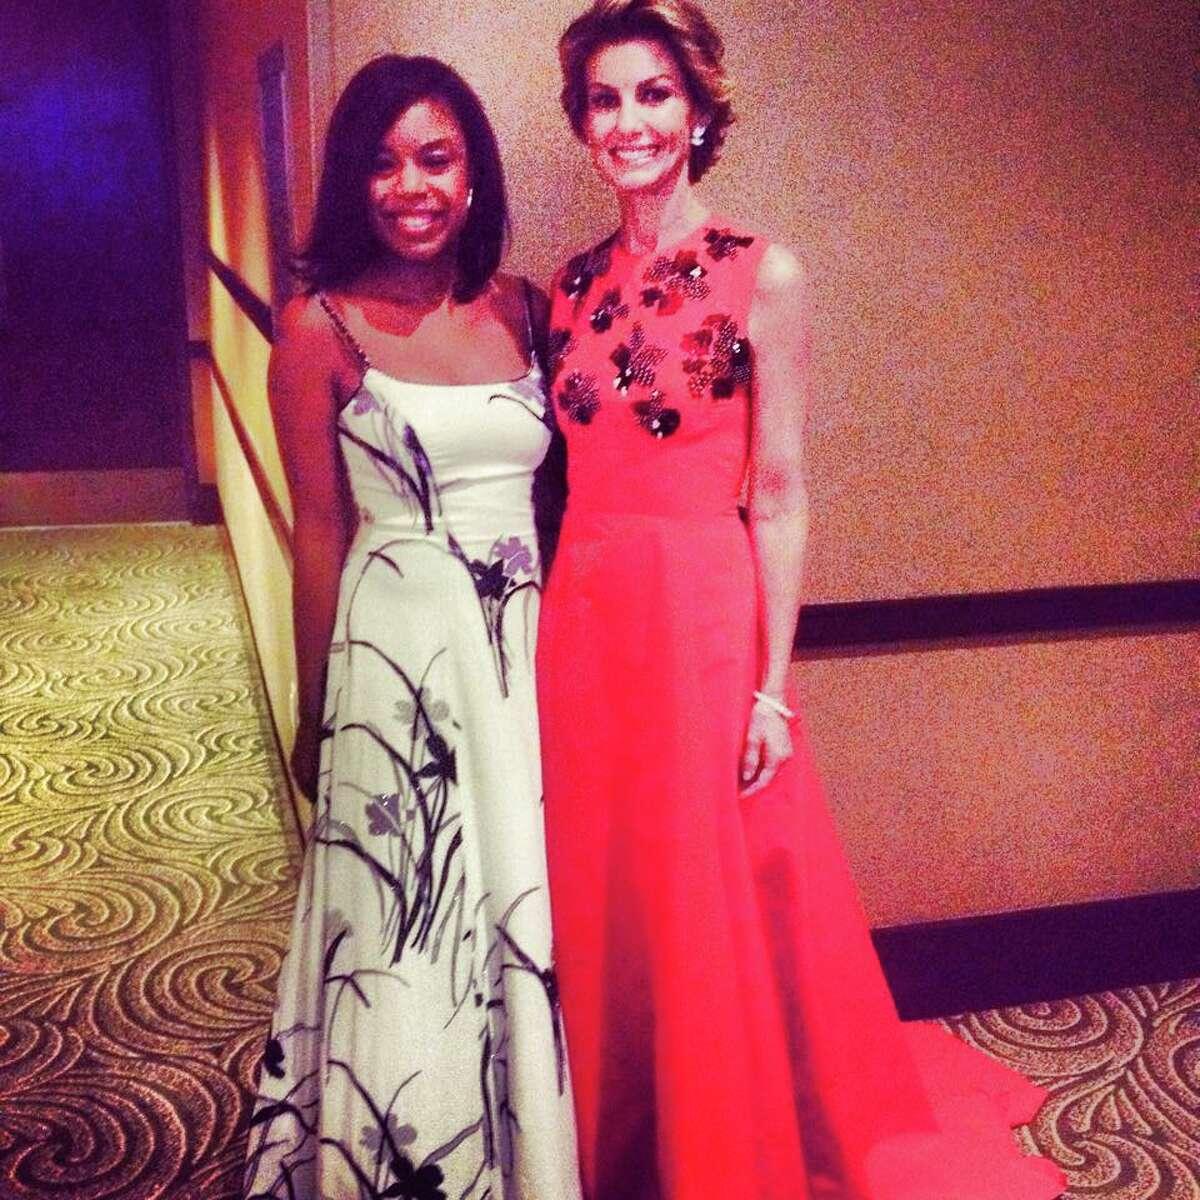 Amber Elliott and Faith Hill at UNICEF's Audrey Hepburn Society Ball 2015.